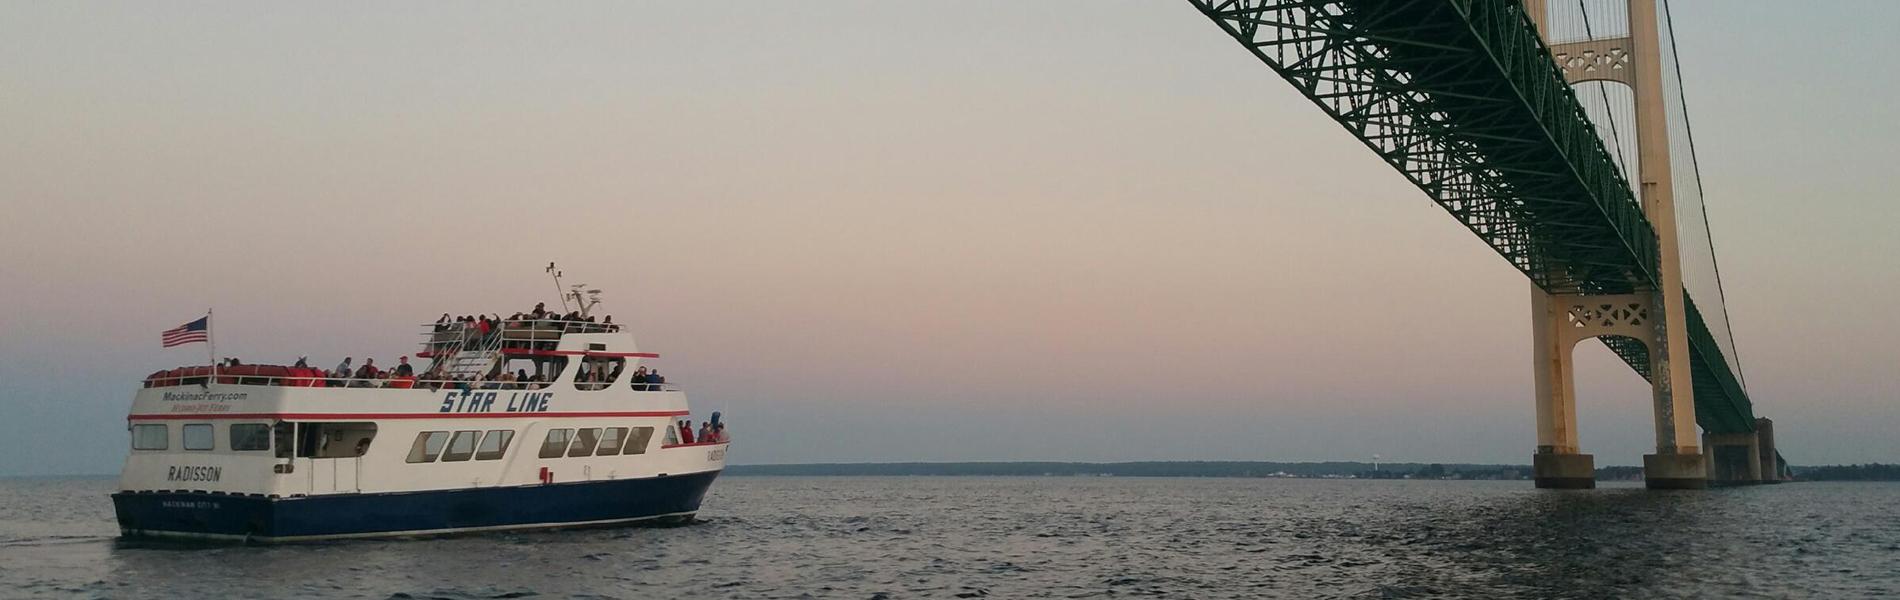 Mackinac Island Star Ferry Schedule